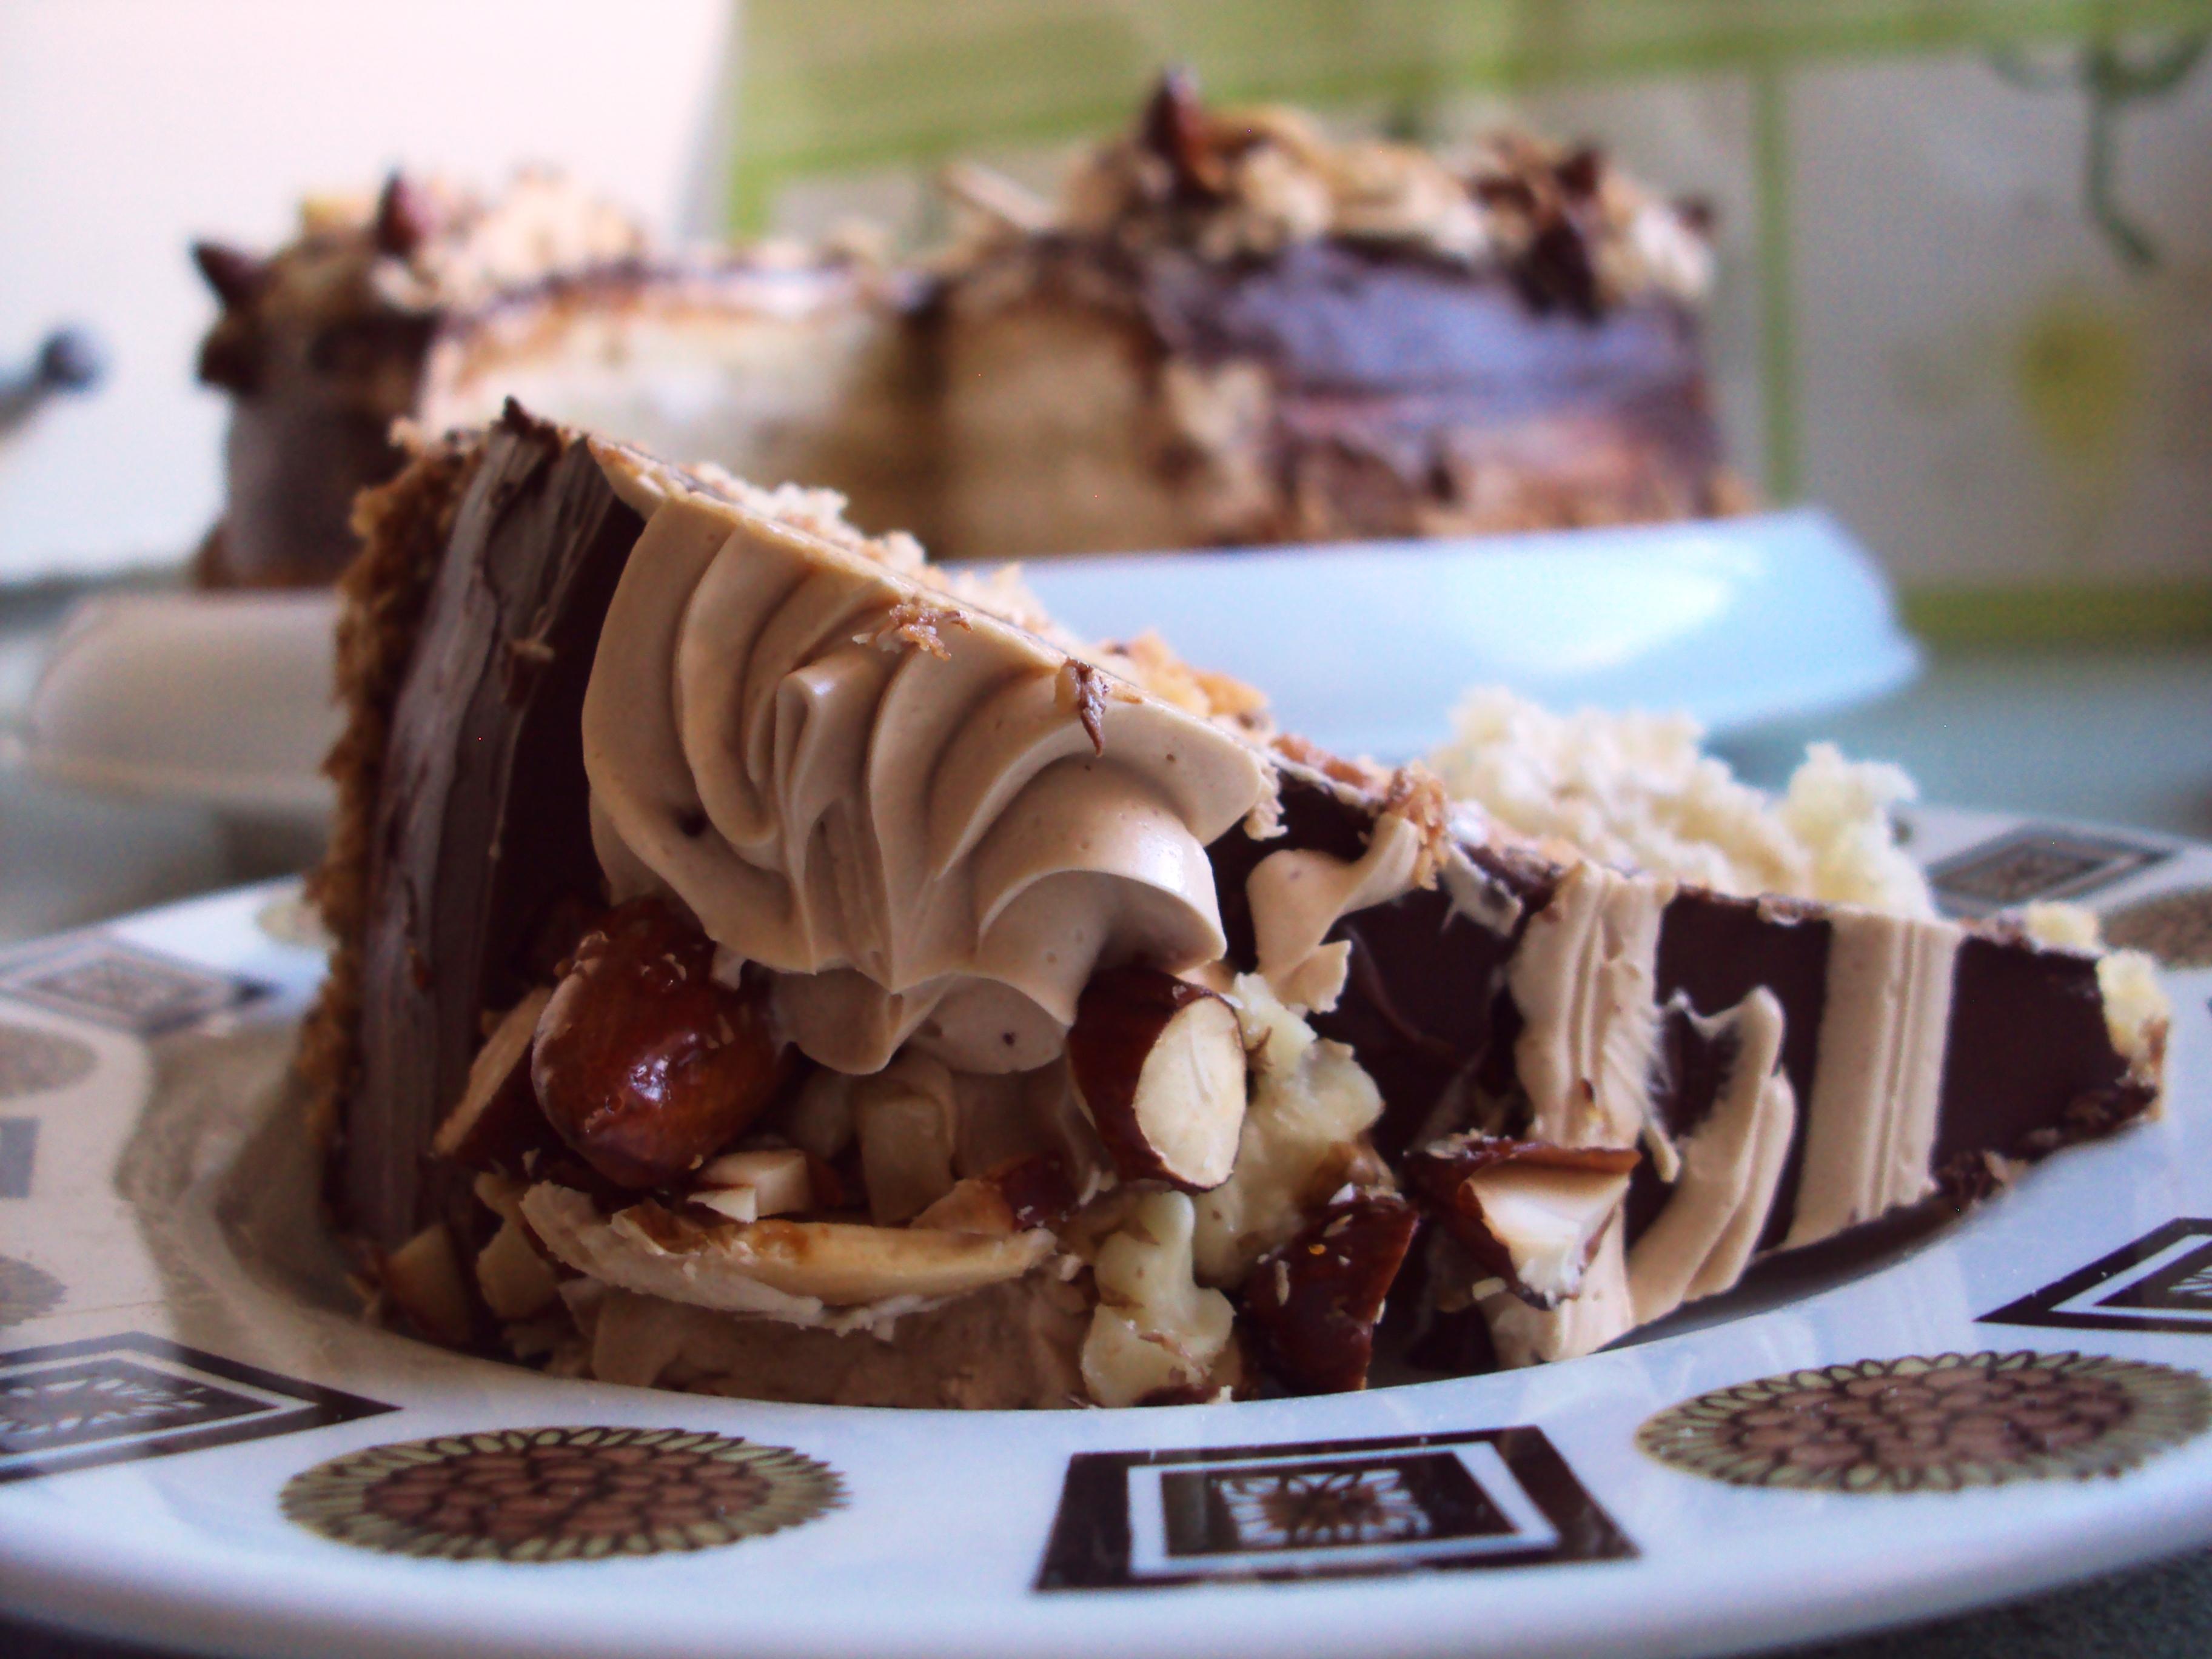 cake 4u by ailaahdo